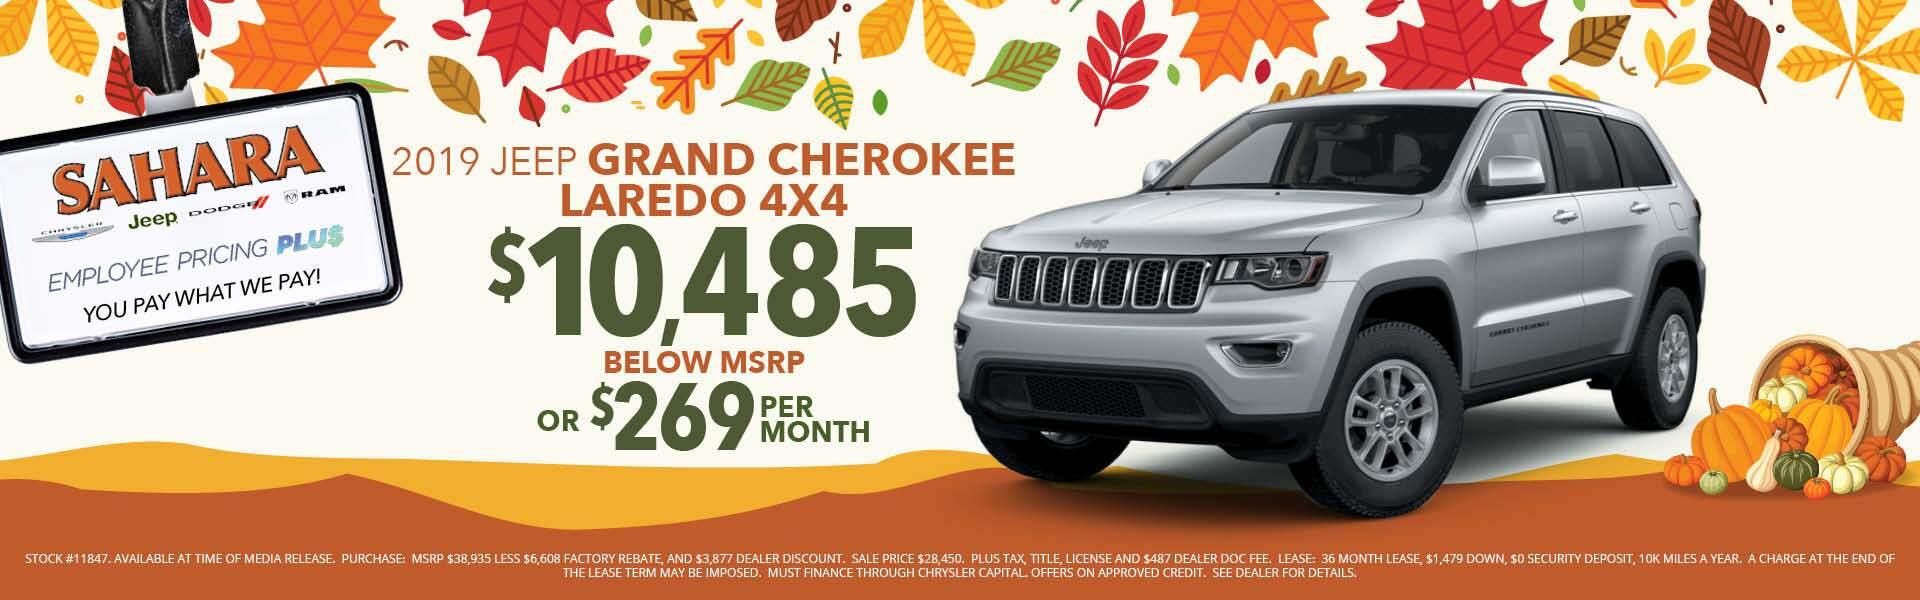 Jeep Dealership Las Vegas >> Chrysler Dodge Jeep Ram Dealership Las Vegas Nv Used